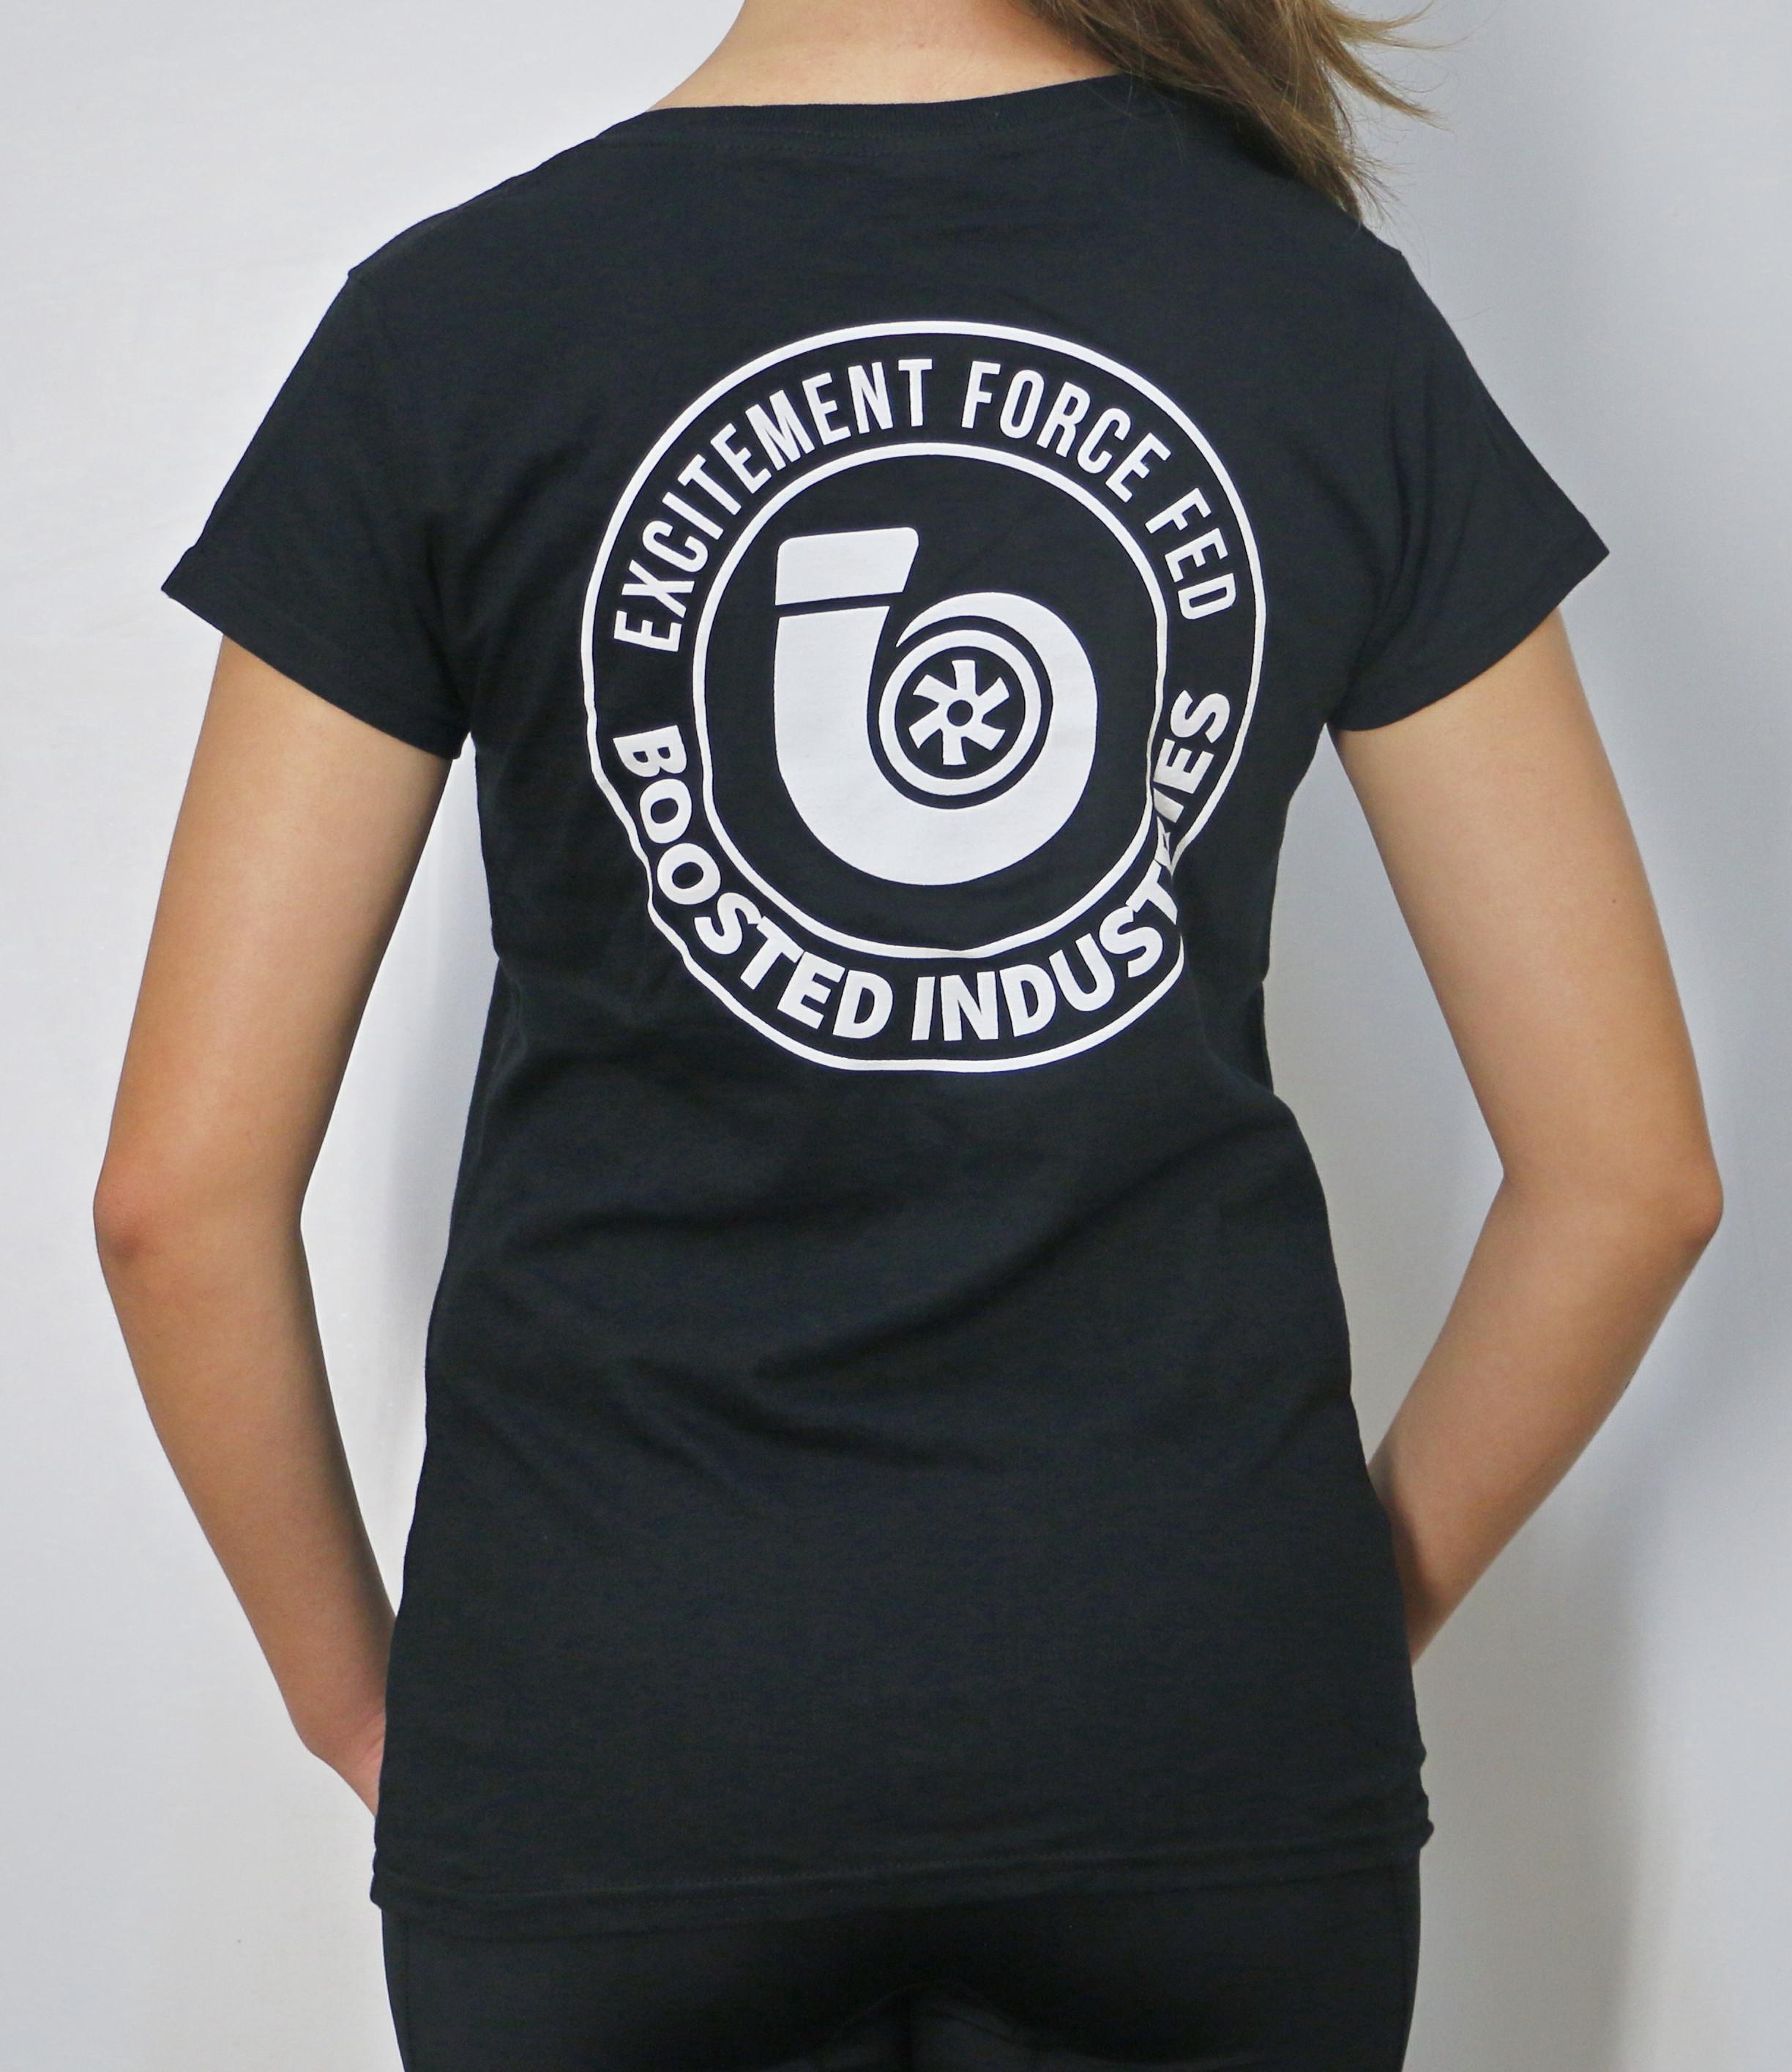 ladies-shirt-black-circle-back_1.jpg